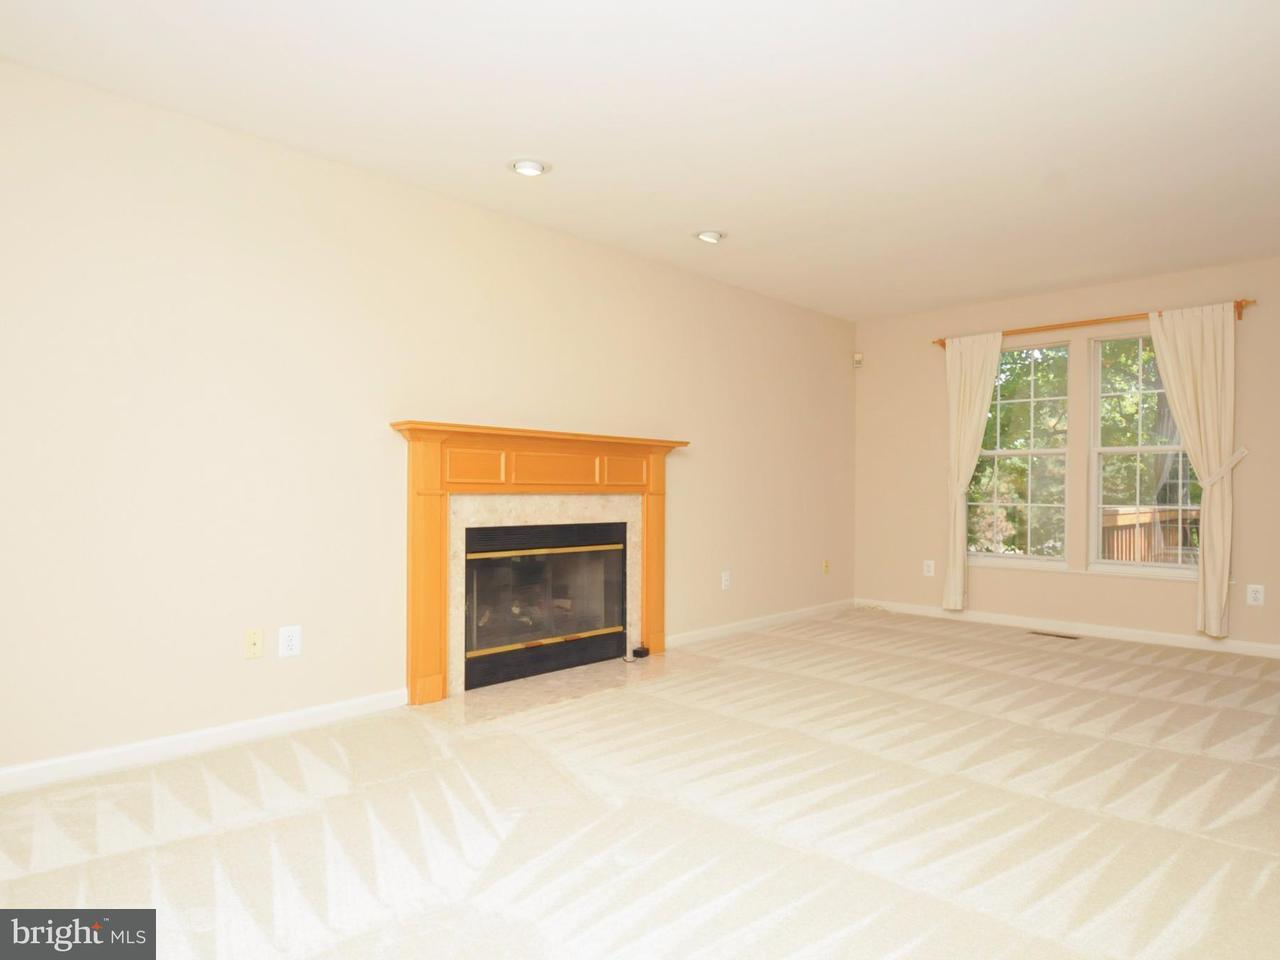 Single Family Home for Sale at 20714 CITATION Drive 20714 CITATION Drive Ashburn, Virginia 20147 United States